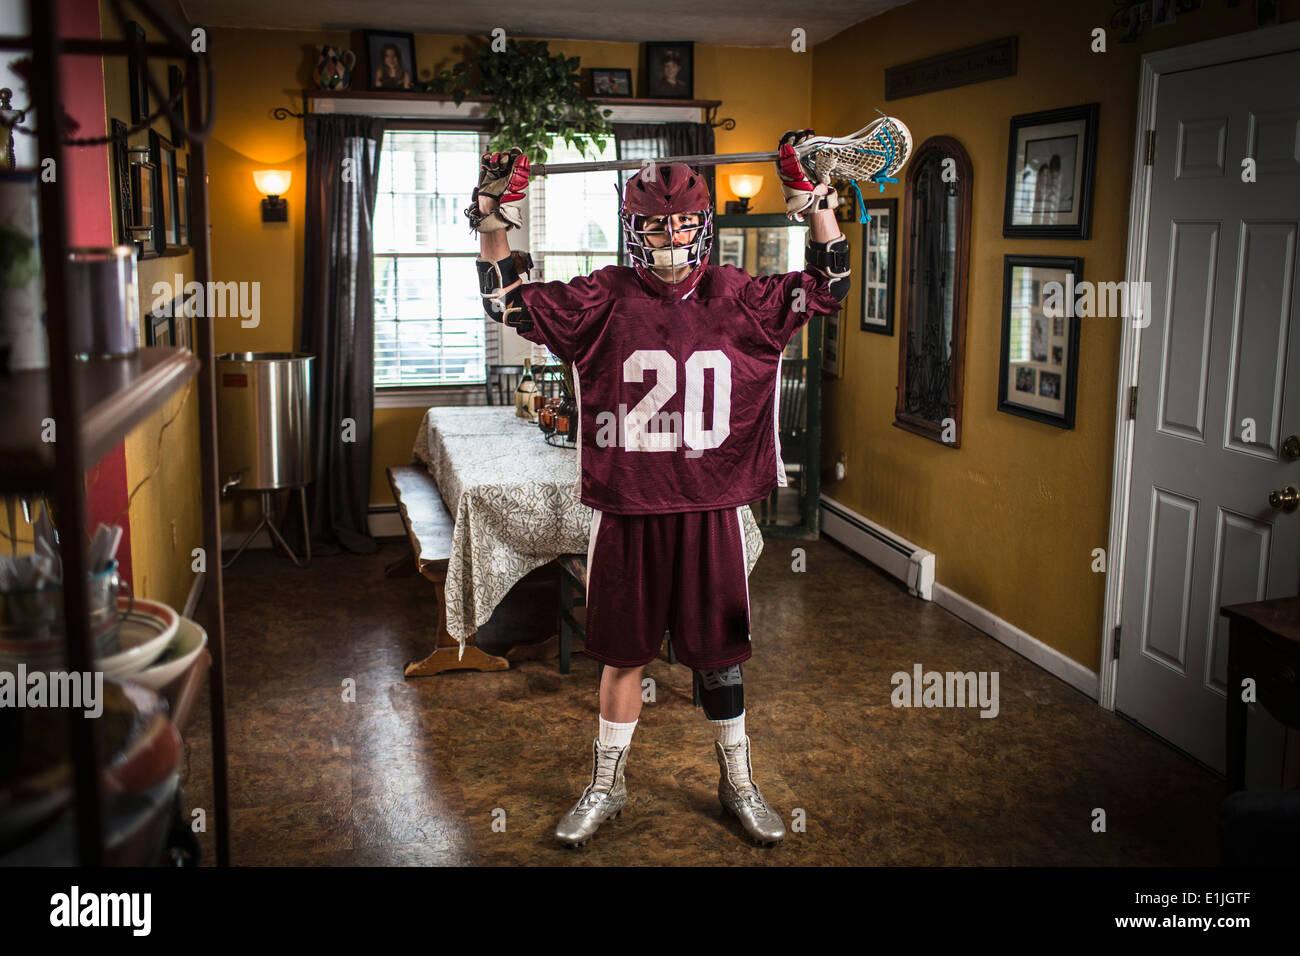 Teenage boy wearing lacrosse uniforme, debout dans la salle à manger Photo Stock